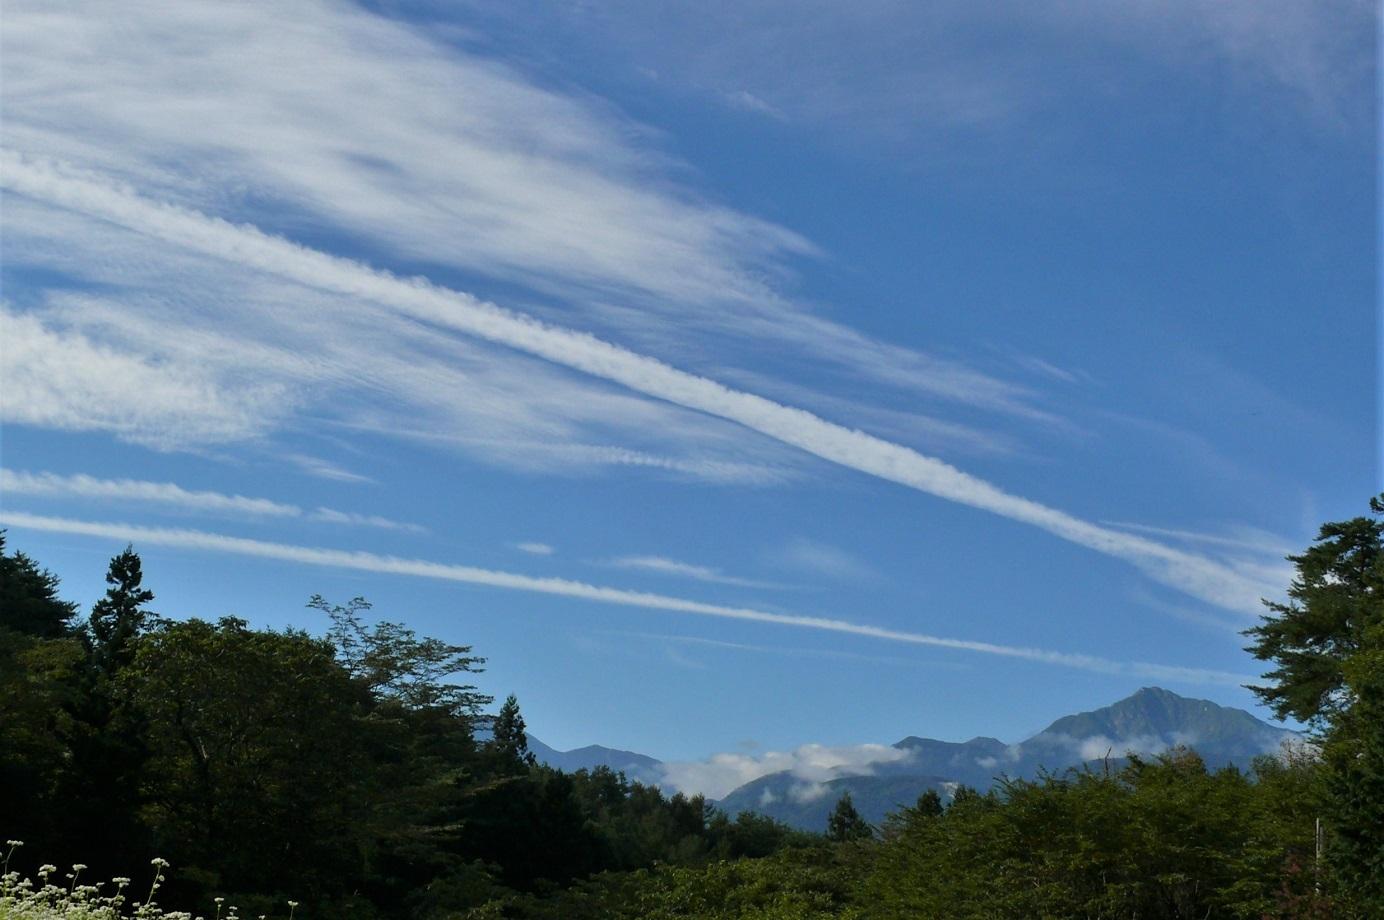 http://www.alpico.co.jp/shikinomori/news/images/P1140240.JPG